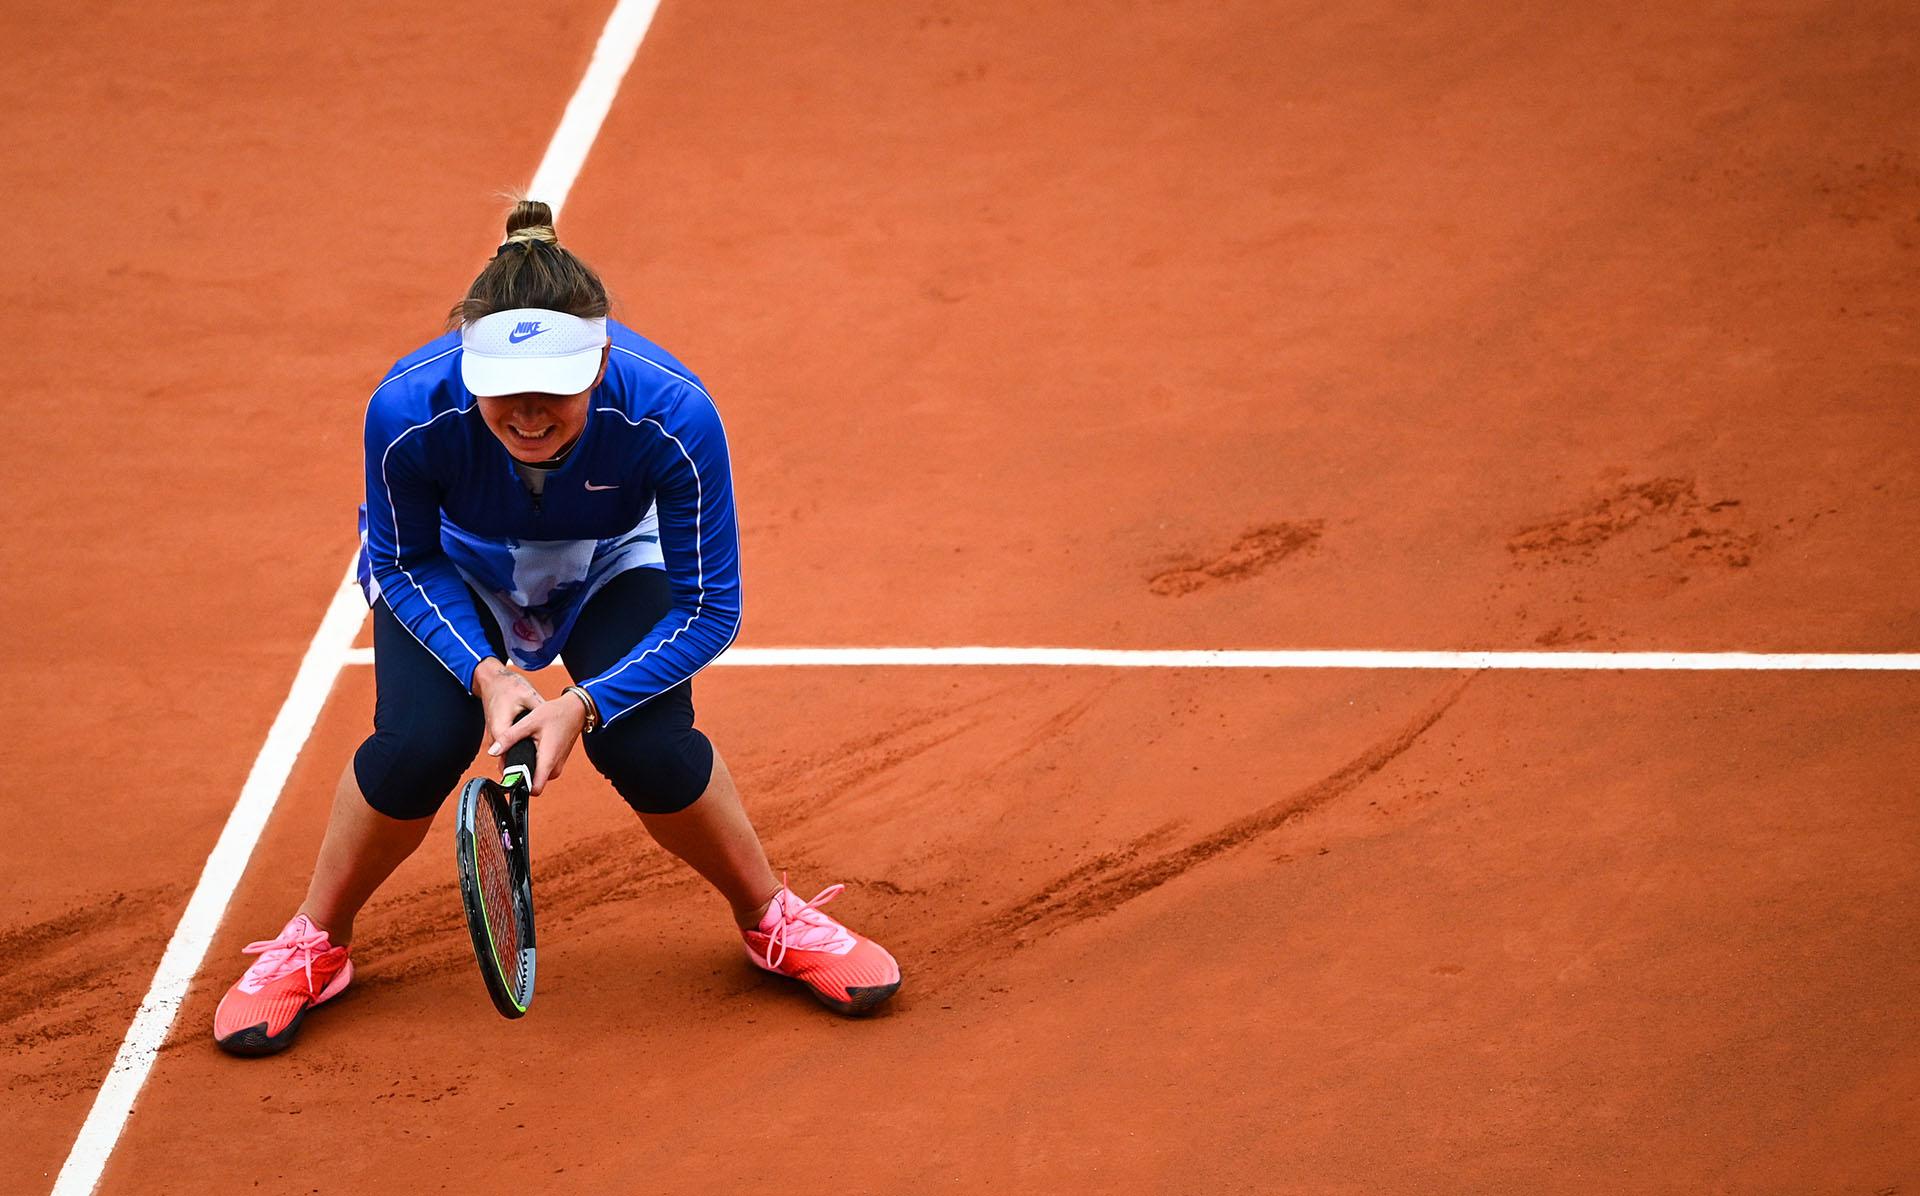 Elina Svitolina no pudo alcanzar las semifinales (Photo by Anne-Christine POUJOULAT / AFP)